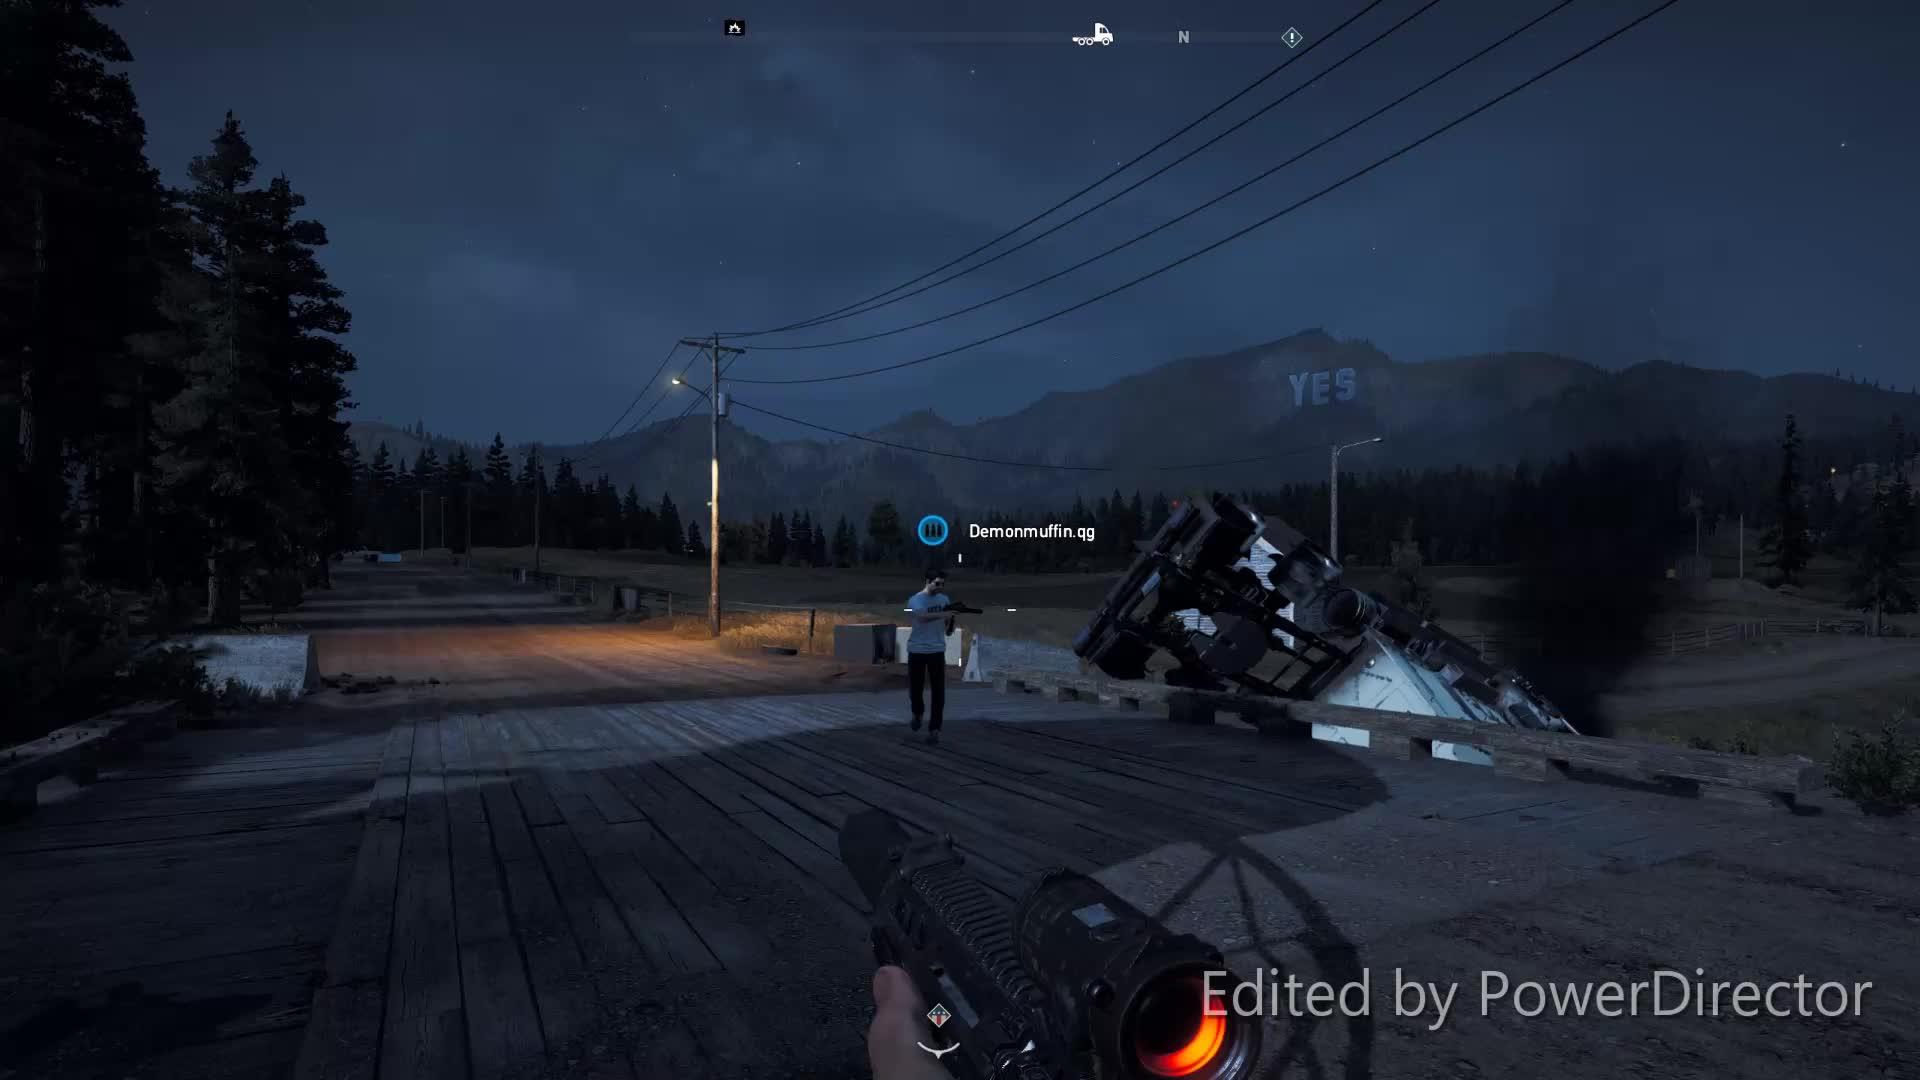 Tyler Goes Skydiving GIFs